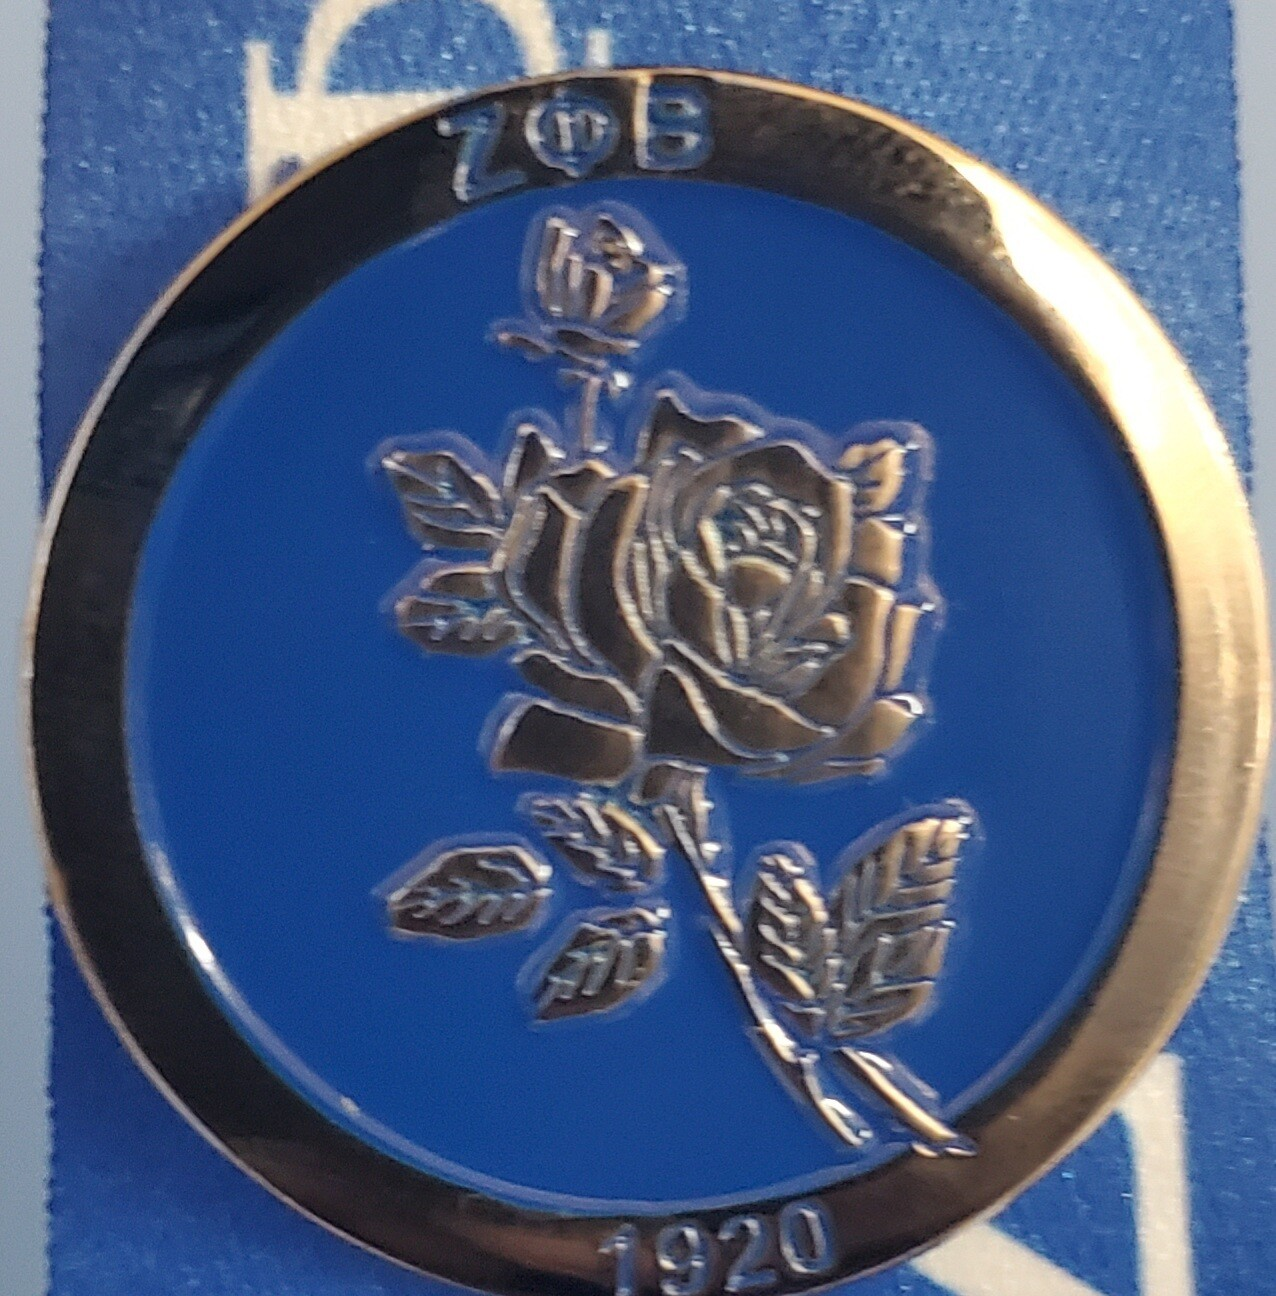 Zeta Rose Lapel Pin